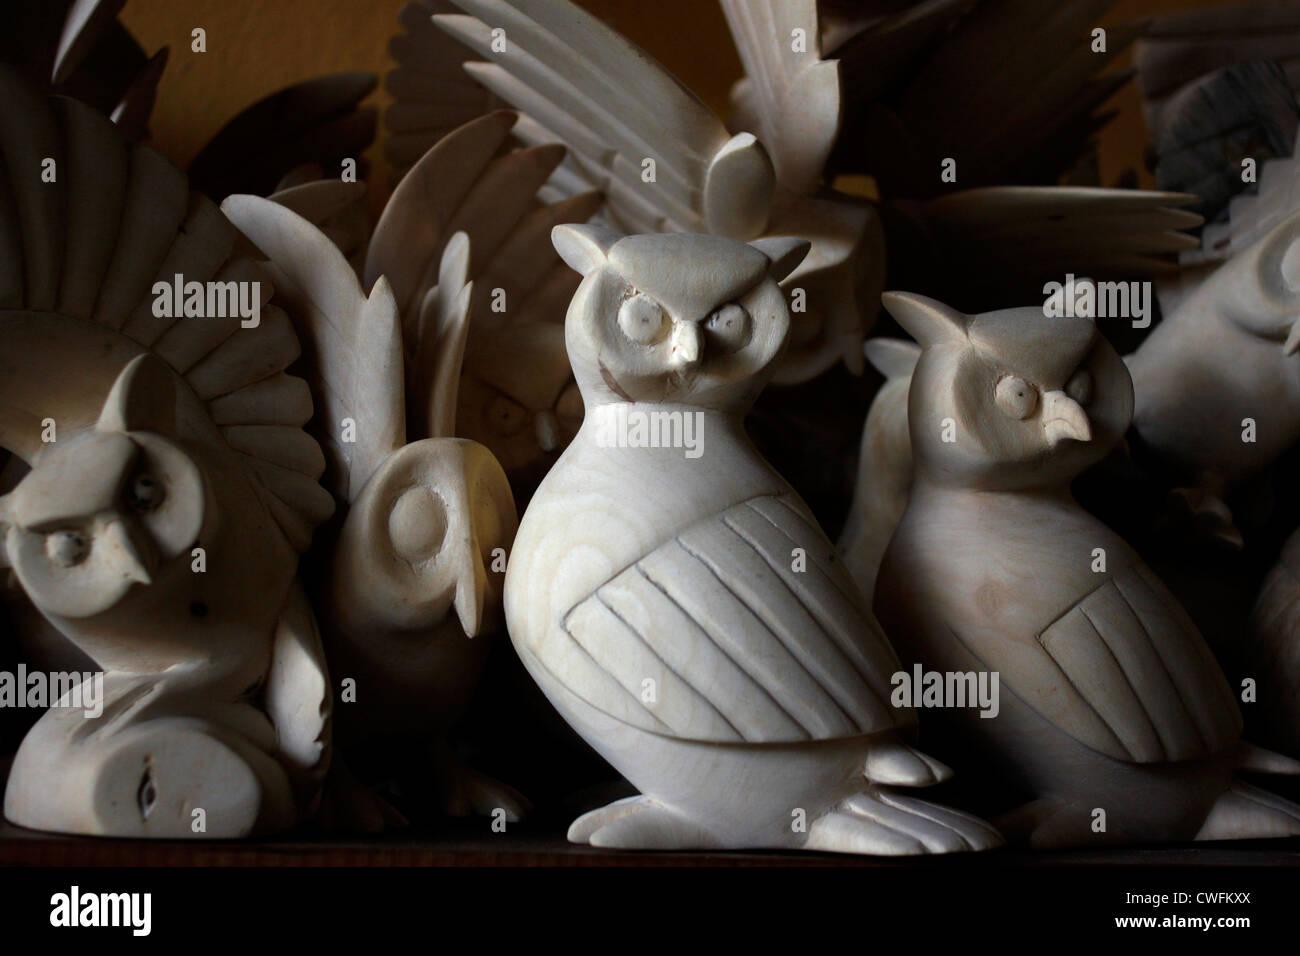 Skulpturen von Eulen in einer Bildhauer-Atelier in San Martin Tilcajete, Oaxaca, Mexiko, 13. Juli 2012. Stockbild